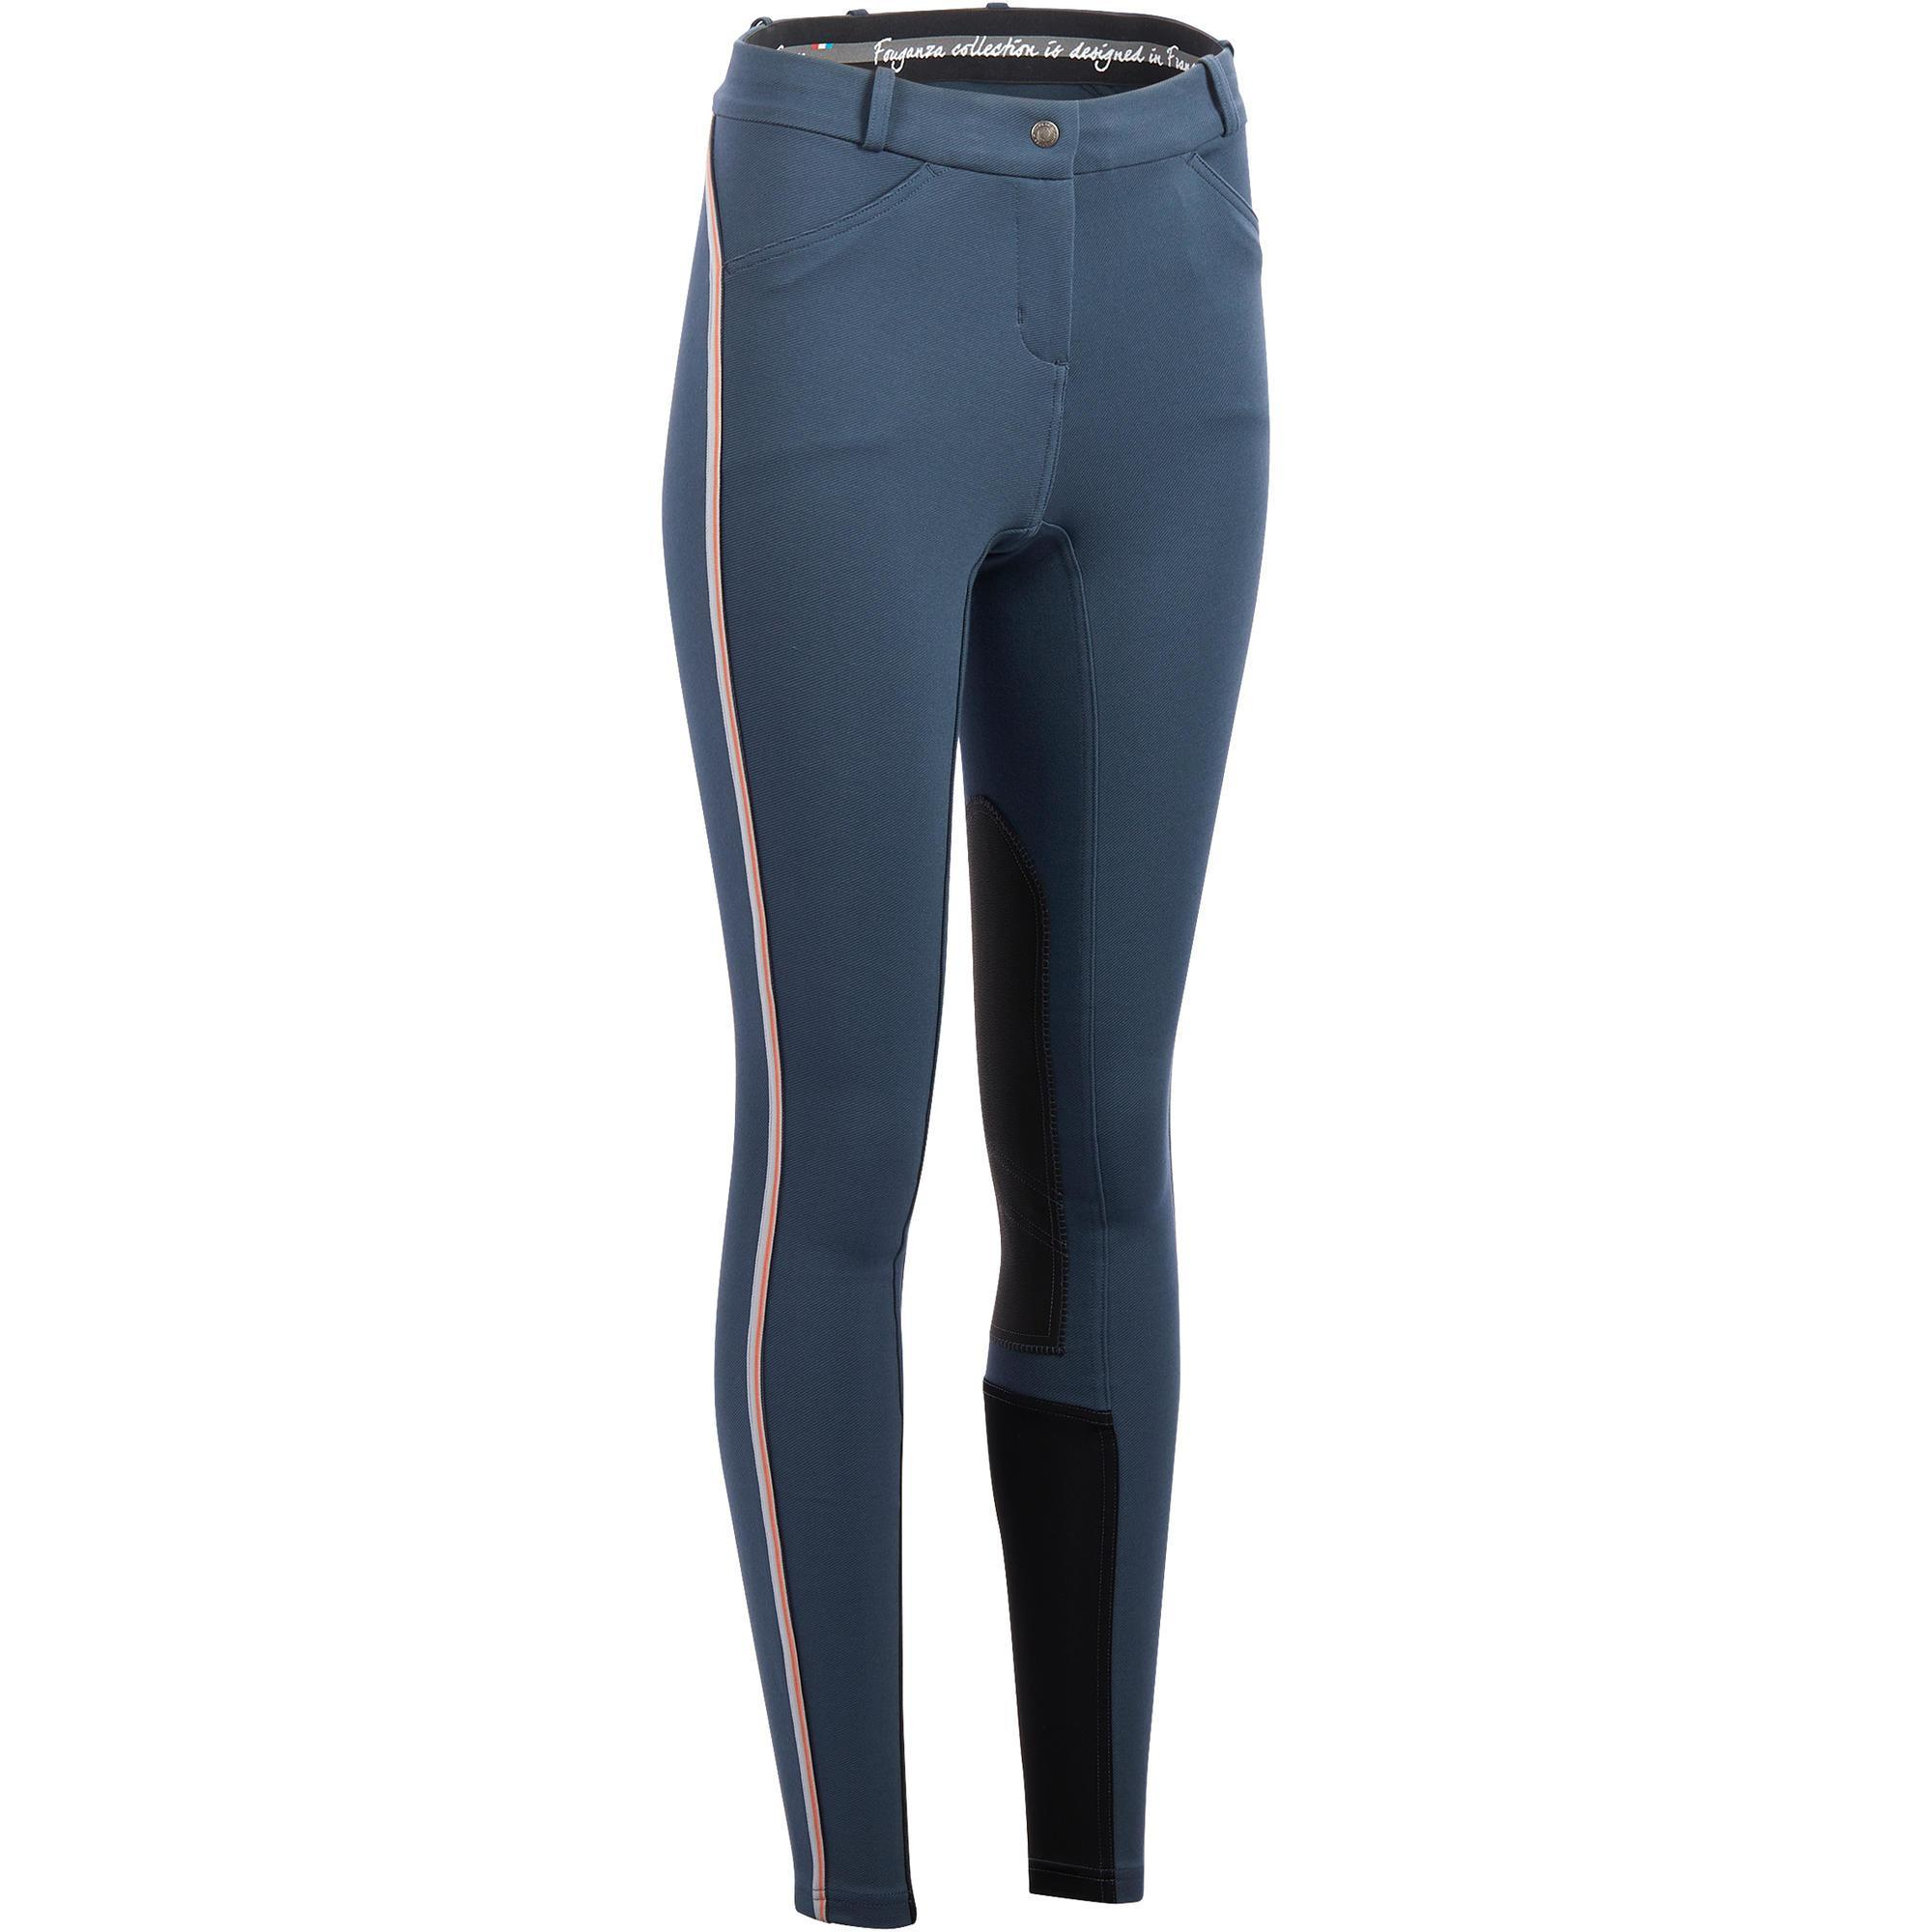 Fouganza Paardrijbroek dames BR340 Stripe antislip kniestukken blauwgrijs